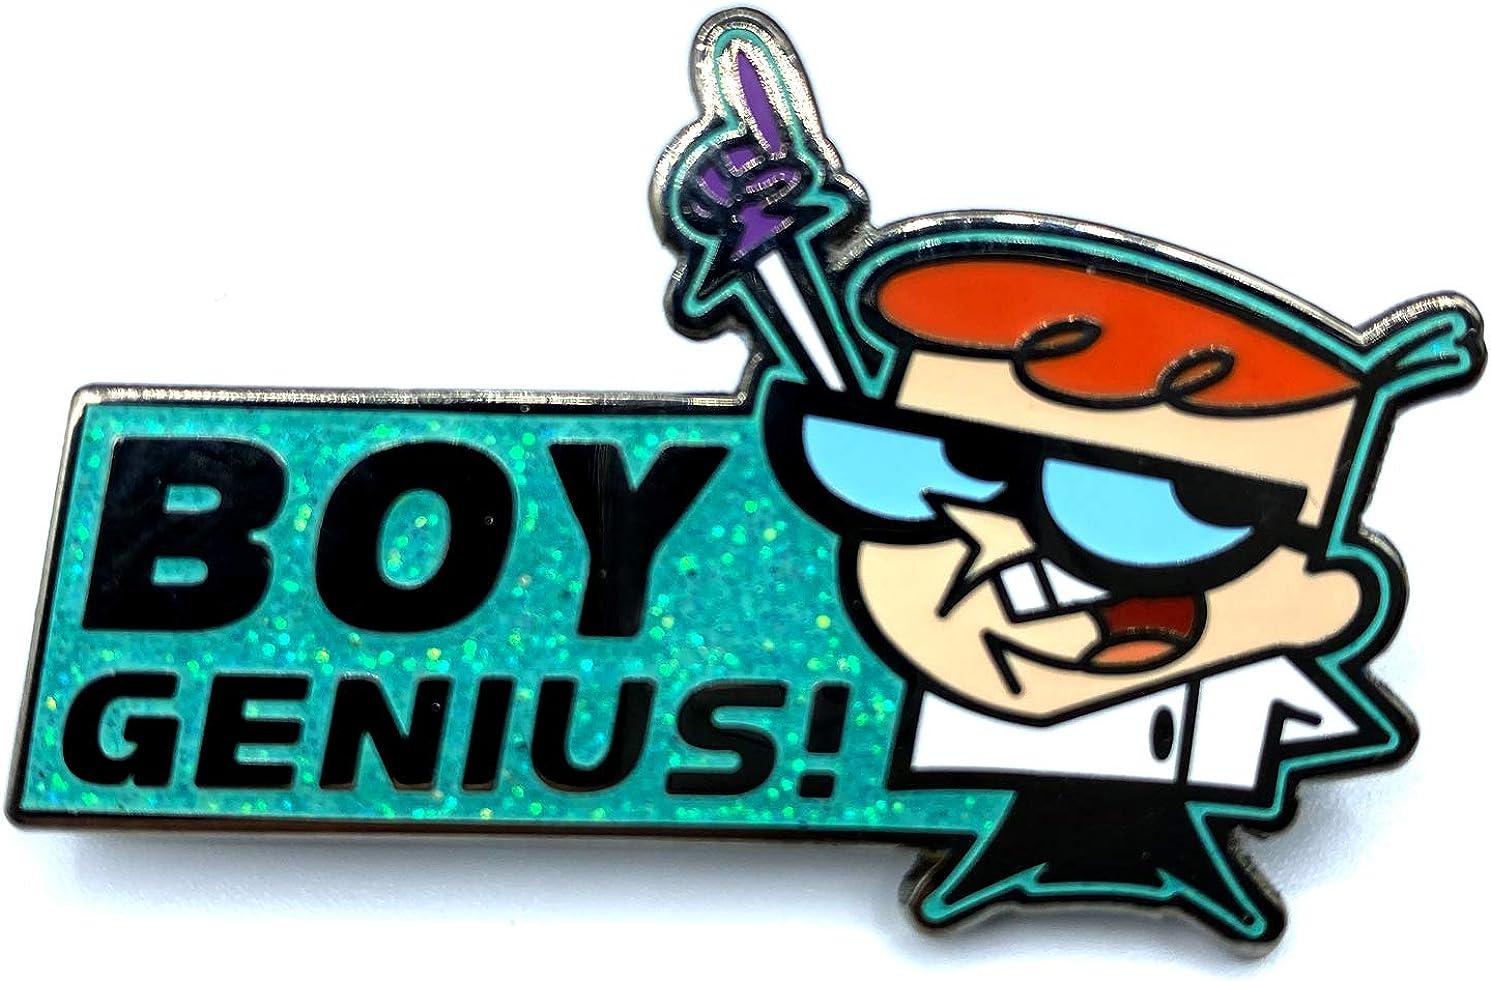 Amazon.com: Dexter, Boy Genius! - Cartoon Network Limited ...